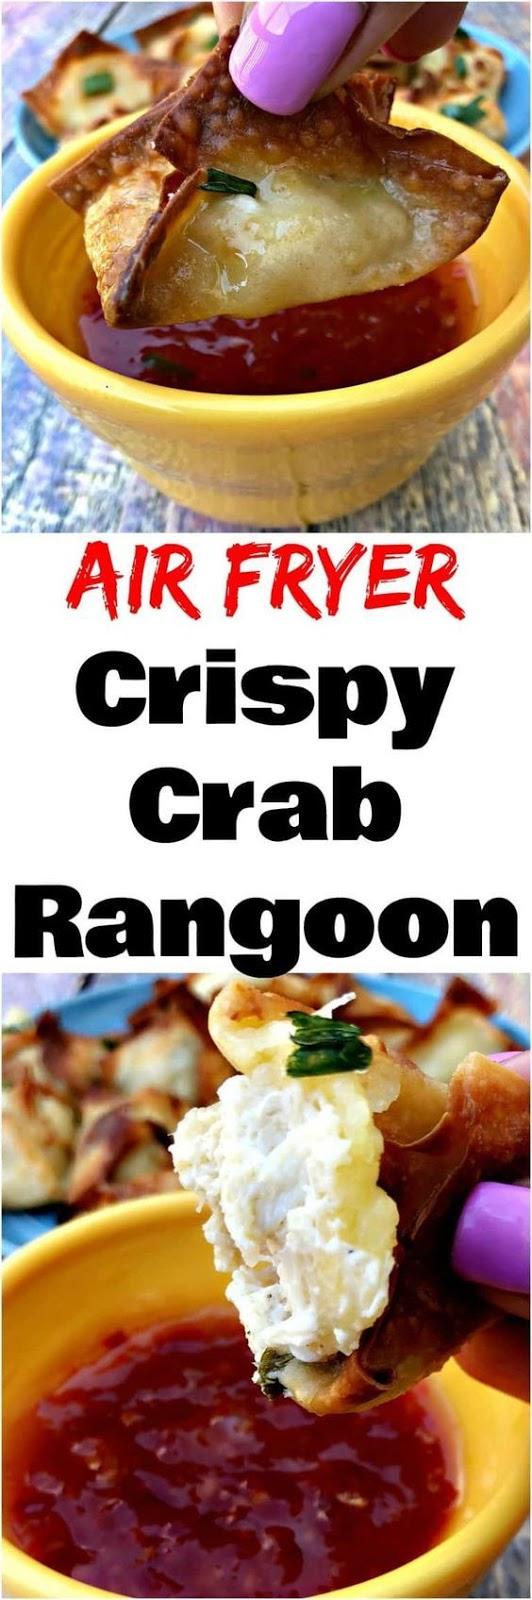 AIR FRYER CRISPY CRAB RANGOON